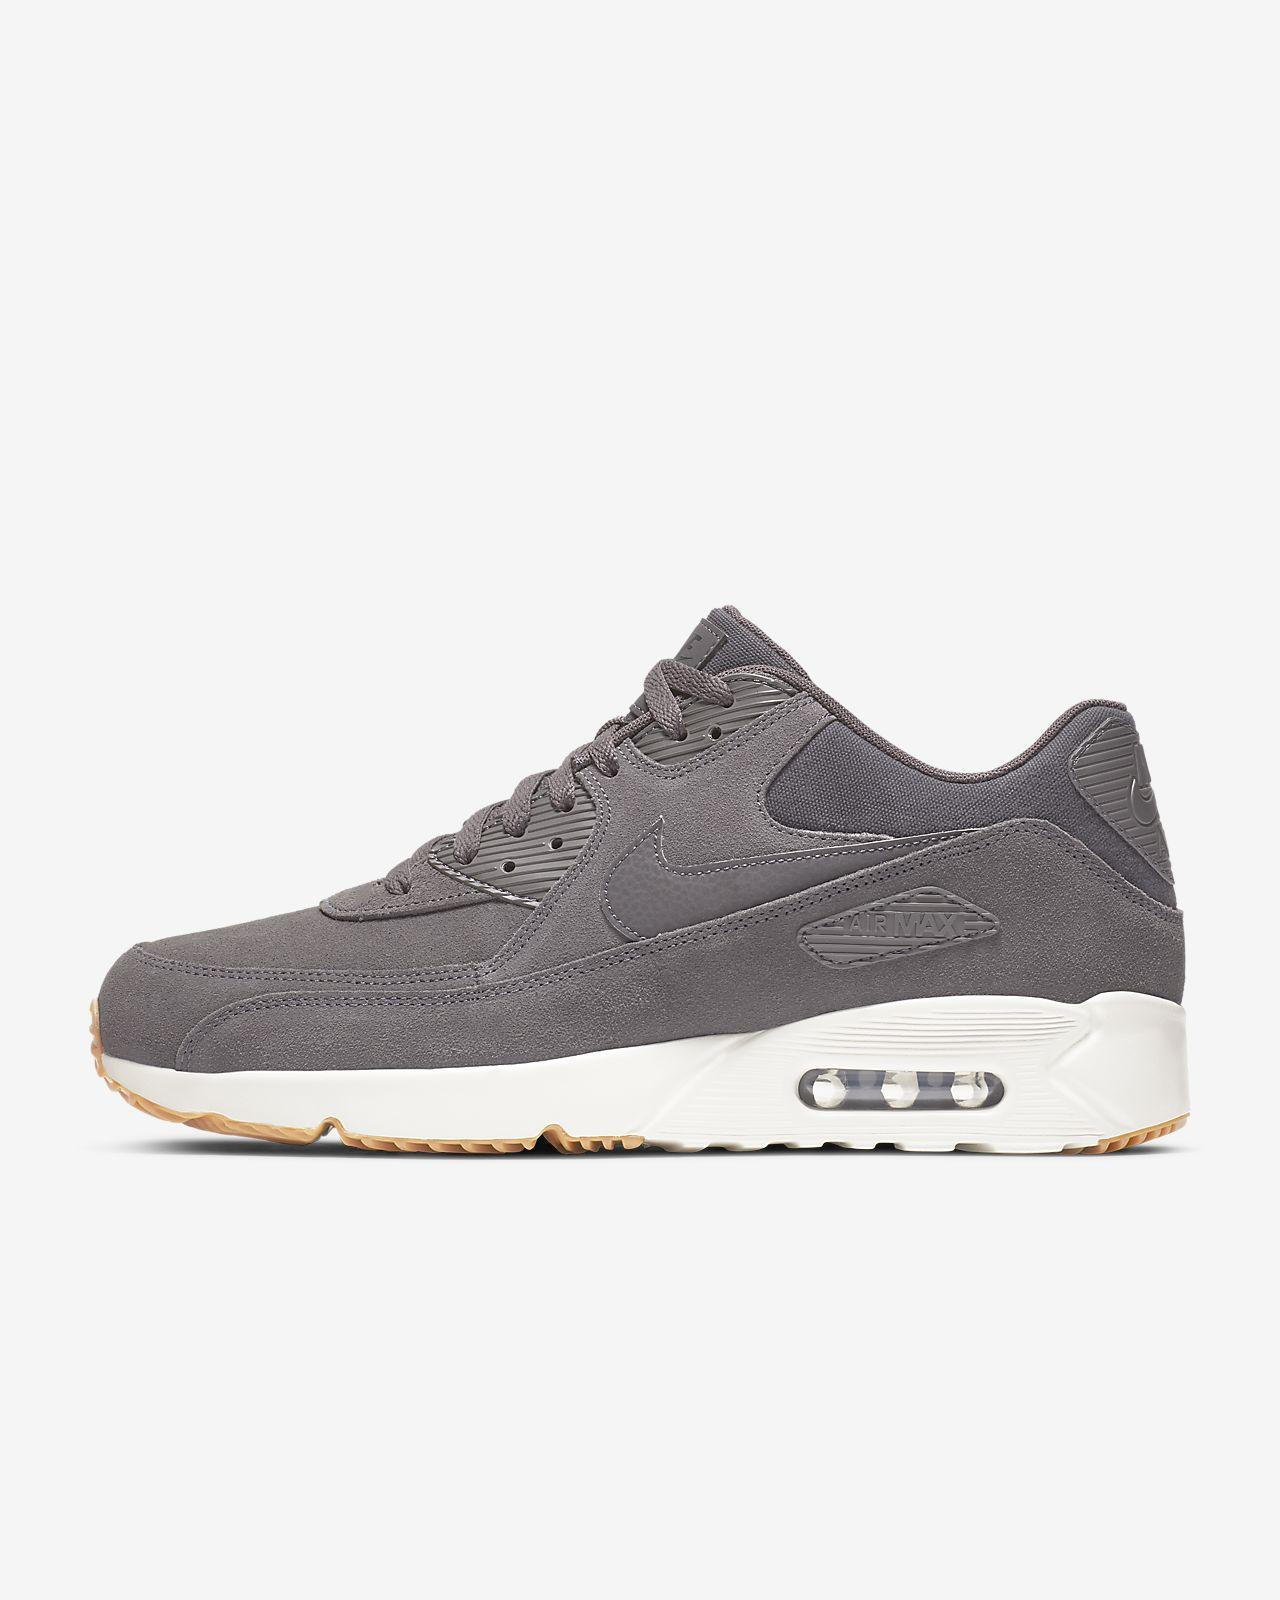 1f41752c5433 Nike Air Max 90 Ultra 2.0 Erkek Ayakkabısı. Nike.com TR